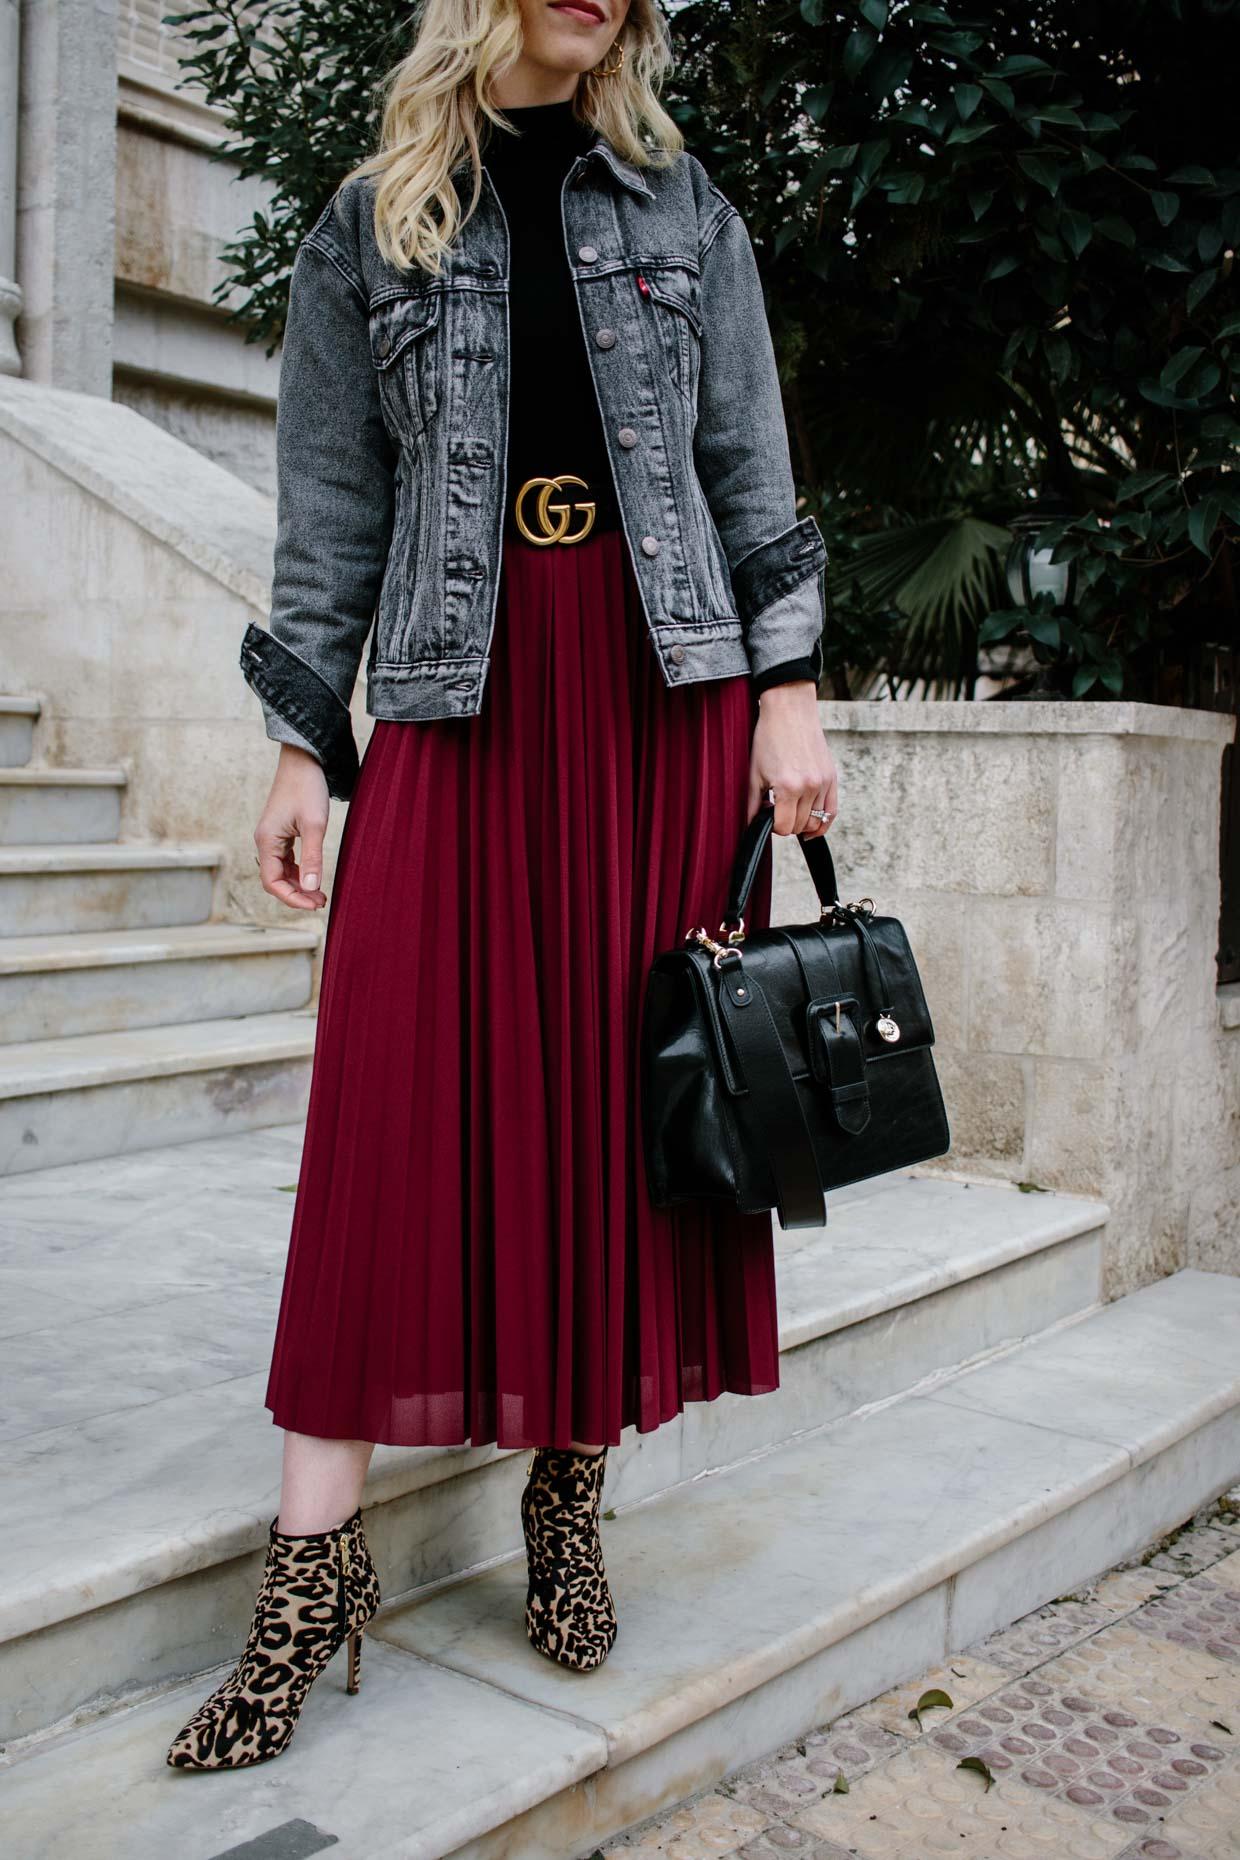 086473d22c Meagan Brandon fashion blogger of Meagan's Moda wears black denim jacket  with Gucci belt, burgundy pleated midi skirt and leopard print boots, ...